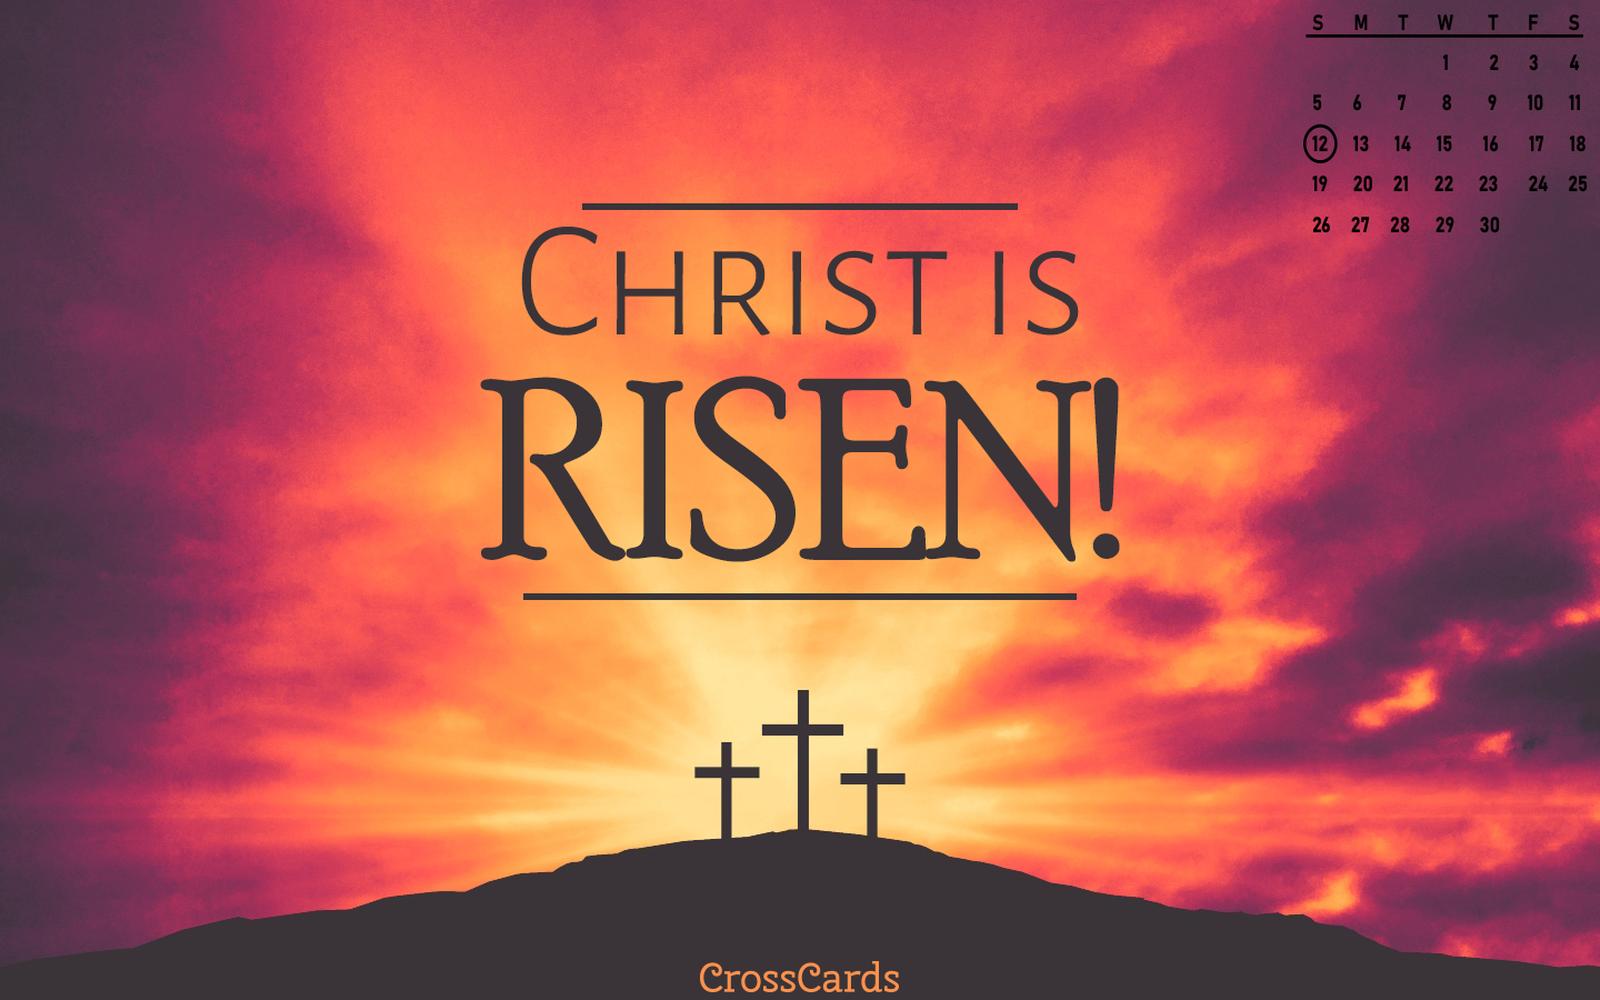 April 2020 - Christ Is Risen! mobile phone wallpaper